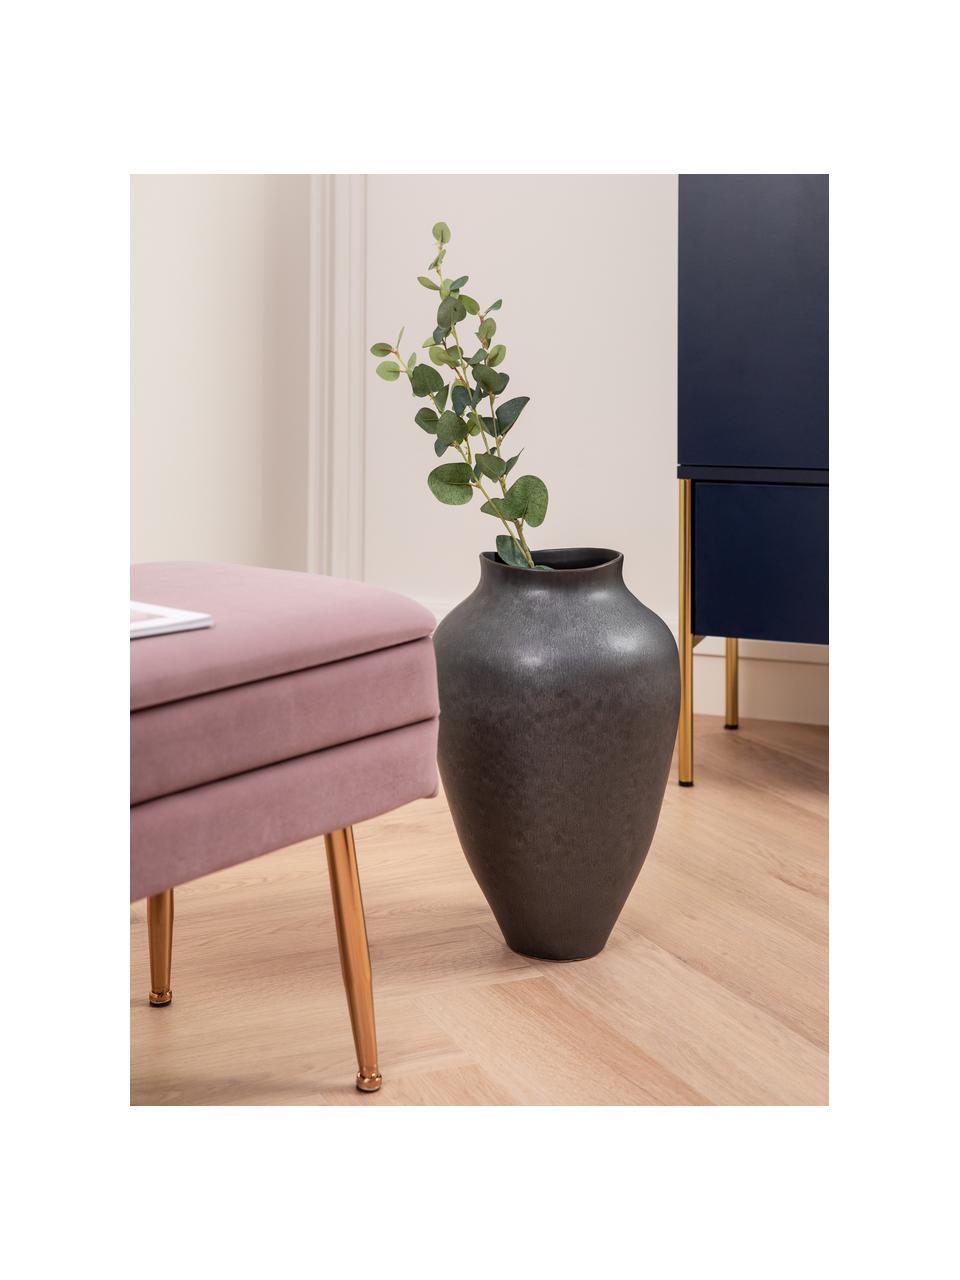 Kunstblume Eukalyptuszweig, Kunststoff, Grün, L 79 cm